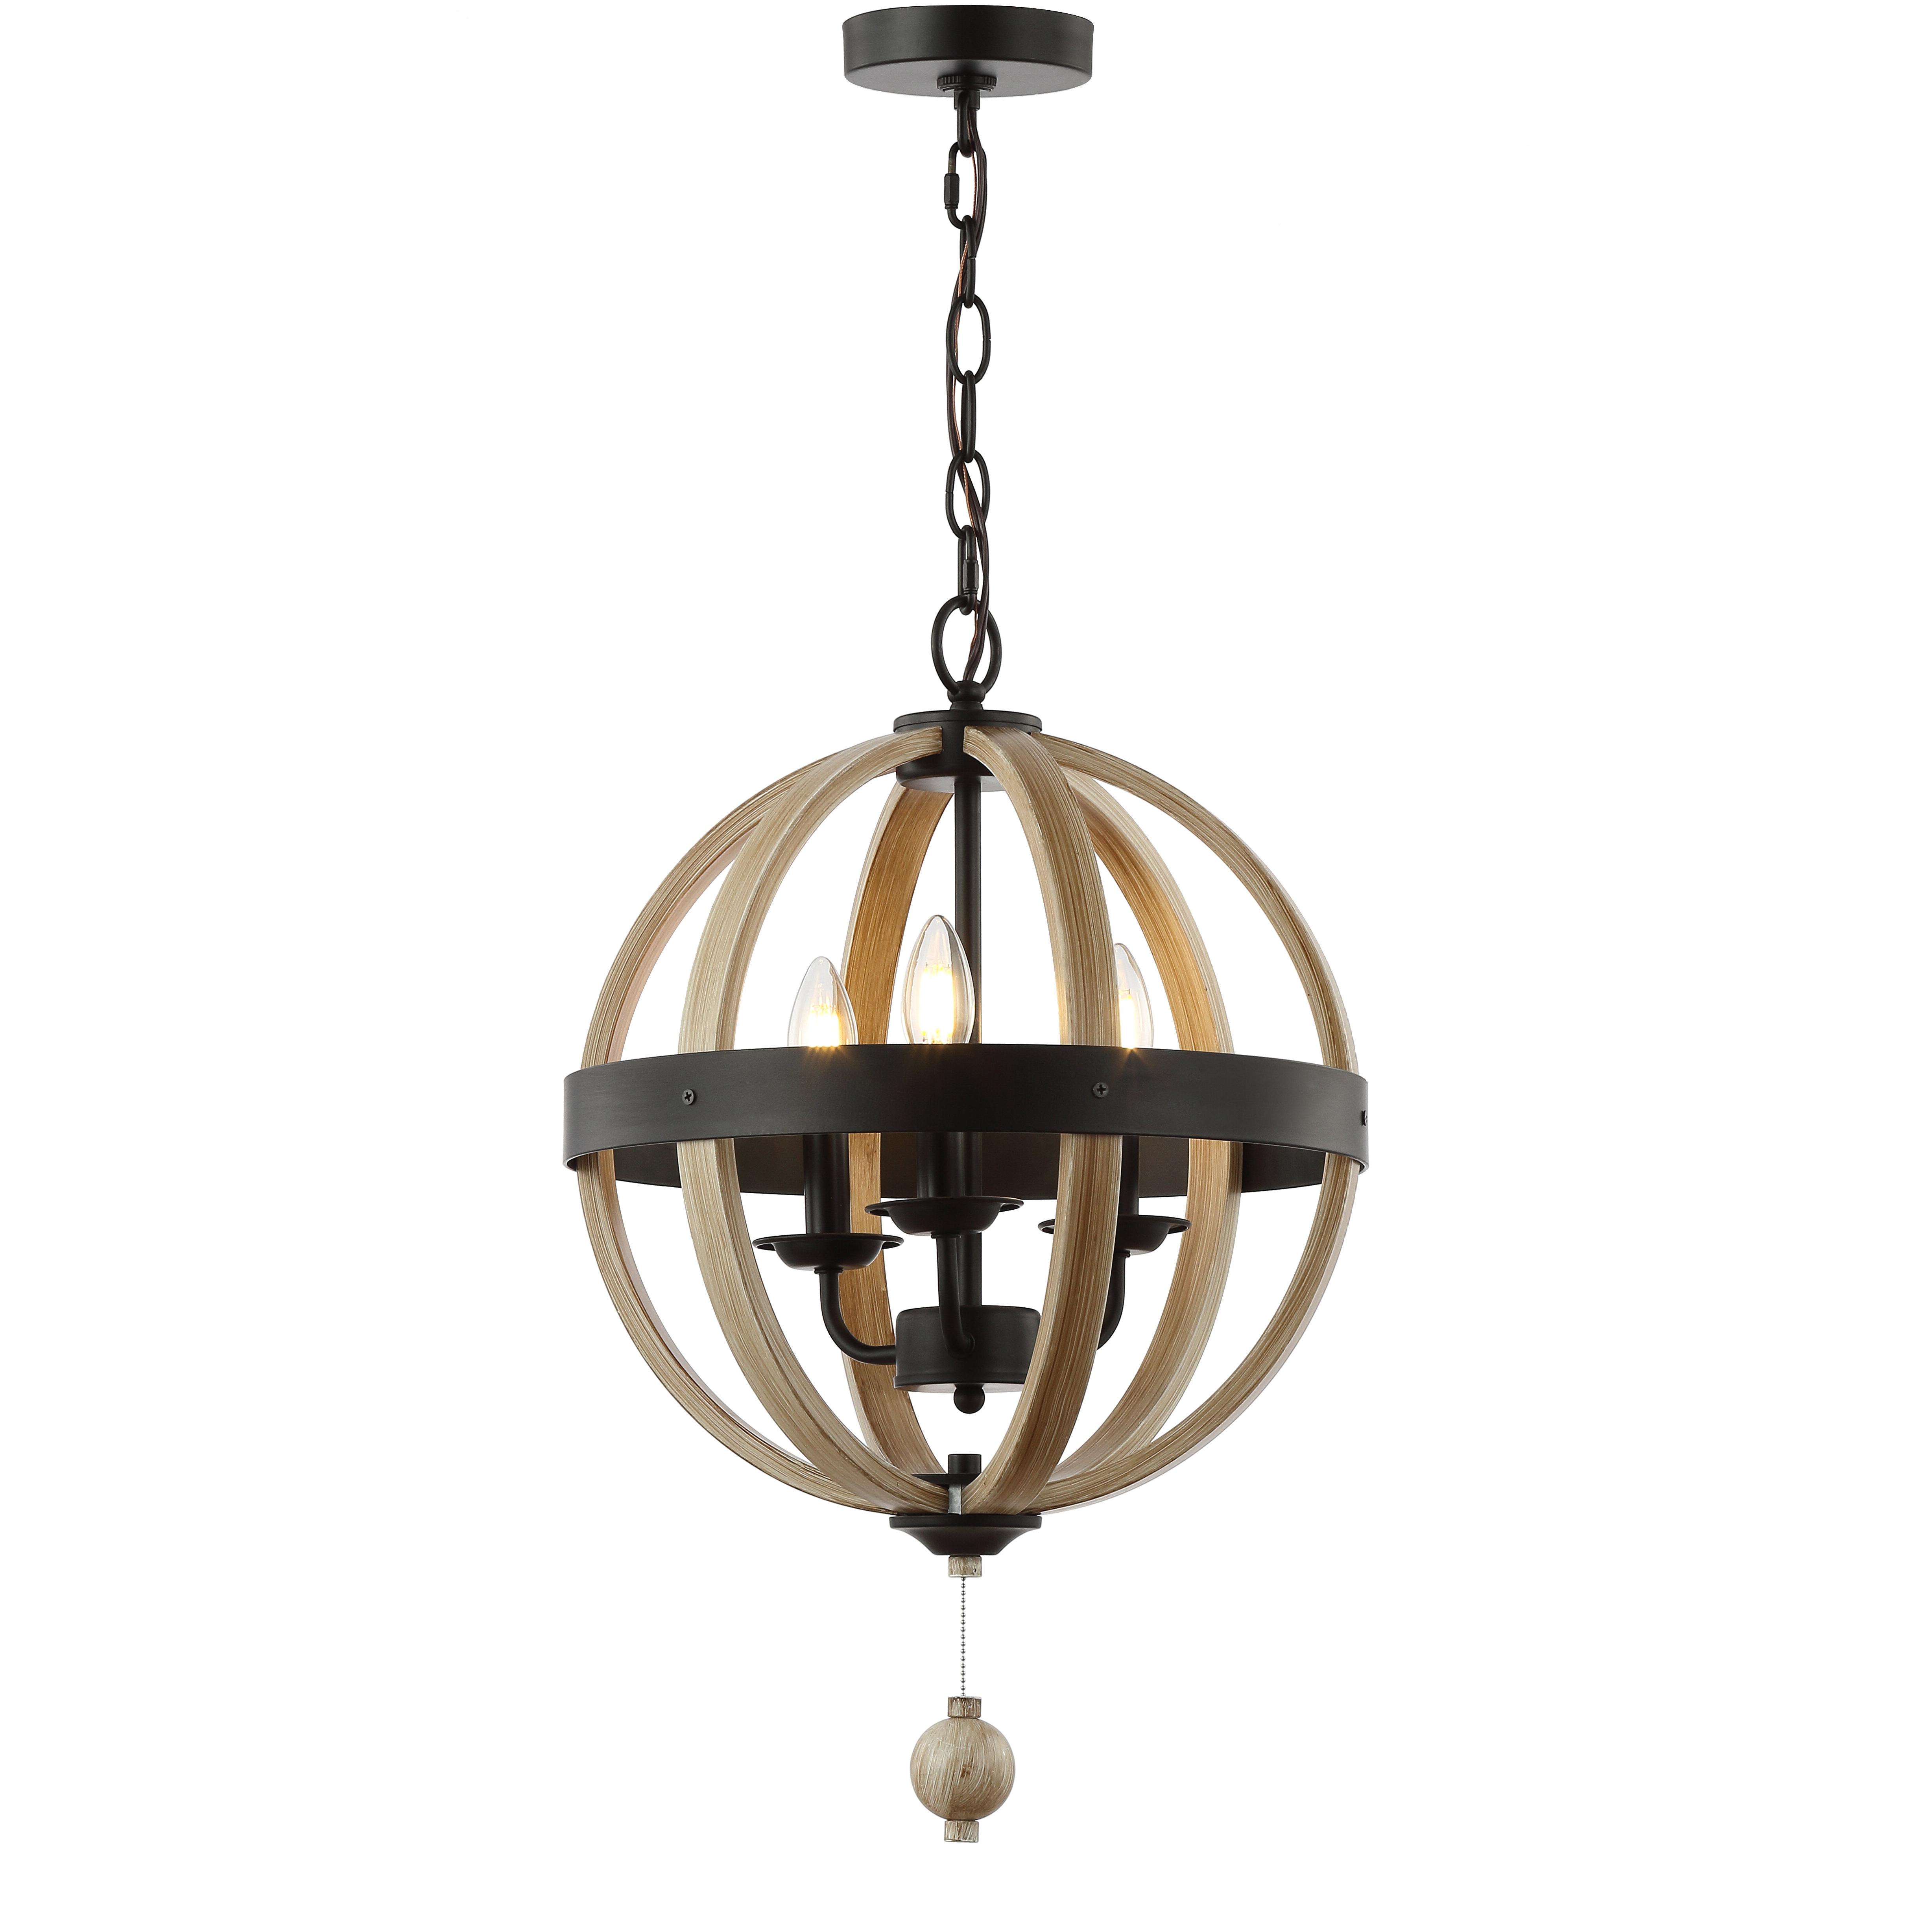 Most Popular La Barge 3 Light Globe Chandeliers Regarding Cauthen 3 Light Globe Chandelier (View 17 of 20)